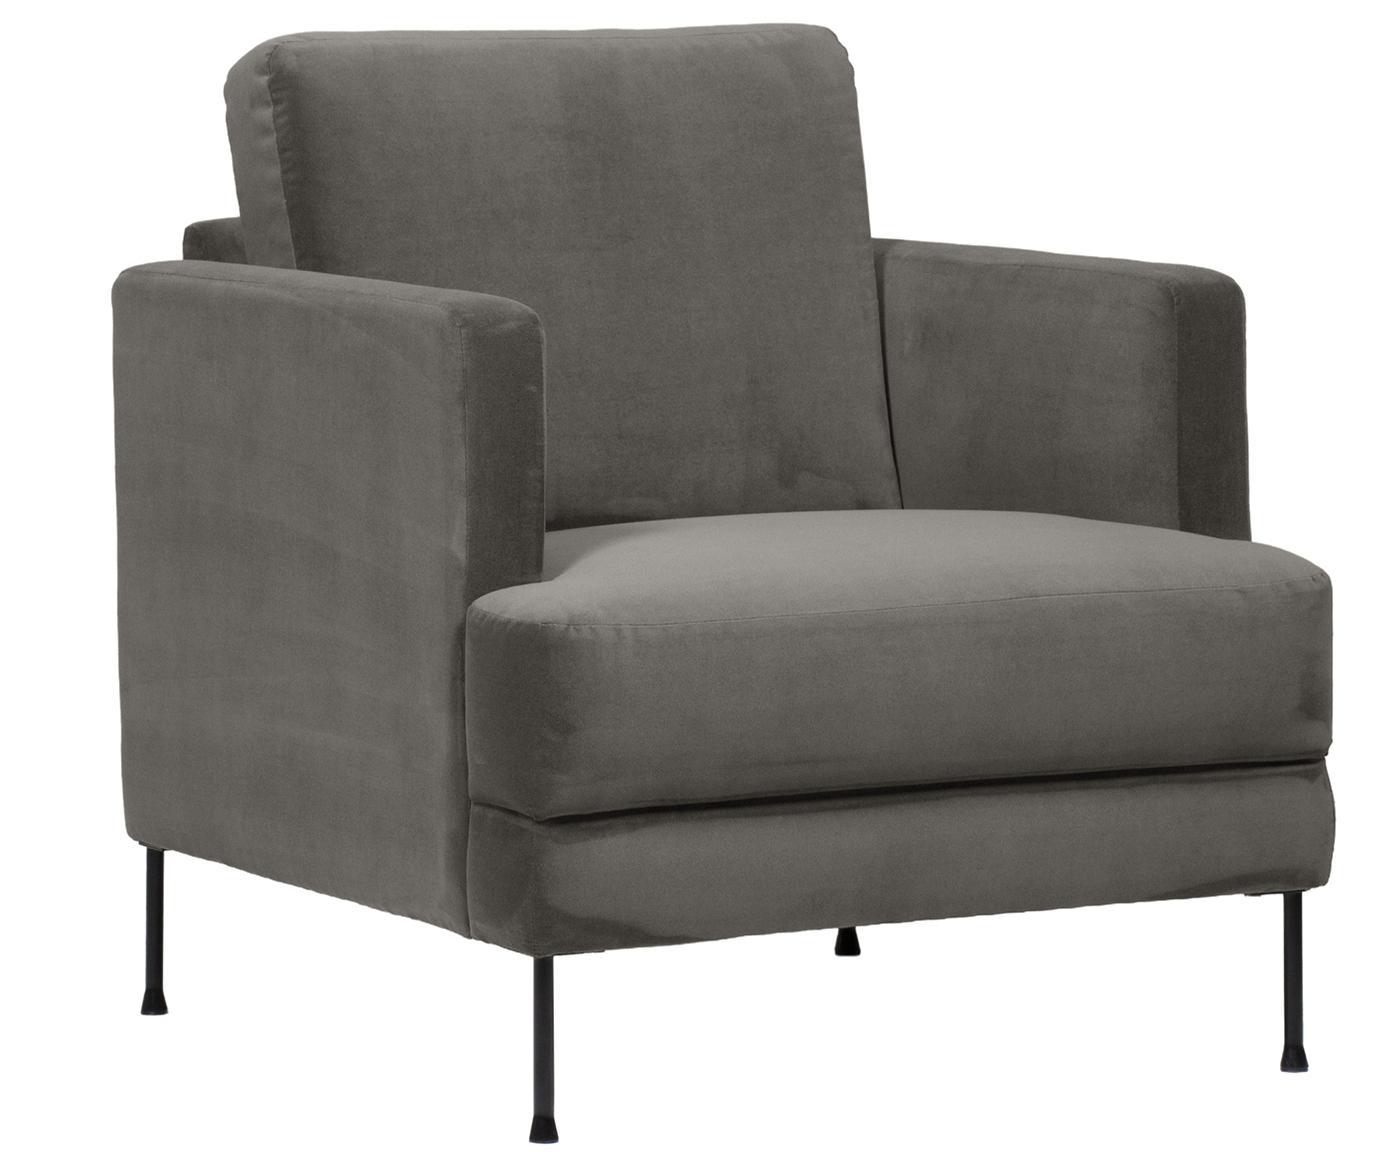 Samt-Sessel Fluente, Bezug: Samt (Hochwertiger Polyes, Gestell: Massives Kiefernholz, Samt Braungrau, B 76 x T 83 cm